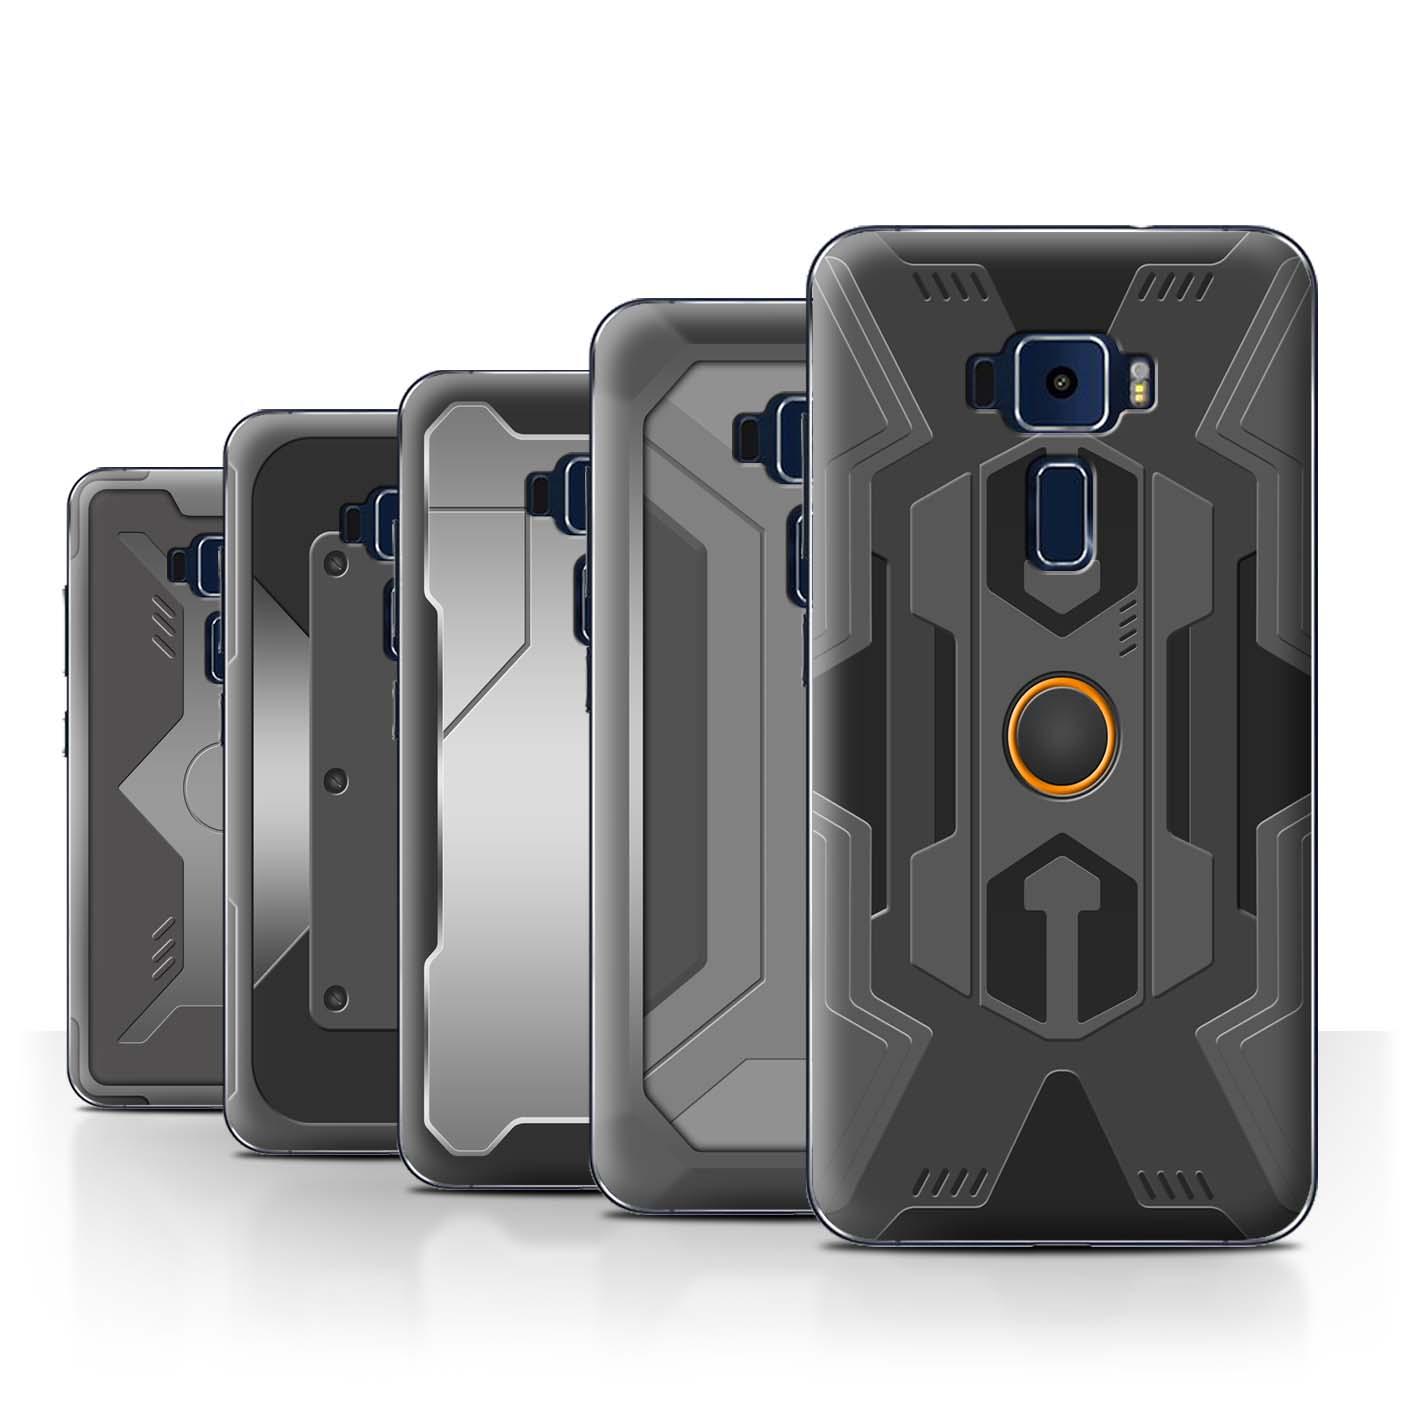 STUFF4-Back-Case-Cover-Skin-for-Asus-Zenfone-3-ZE552KL-Armour-Armor